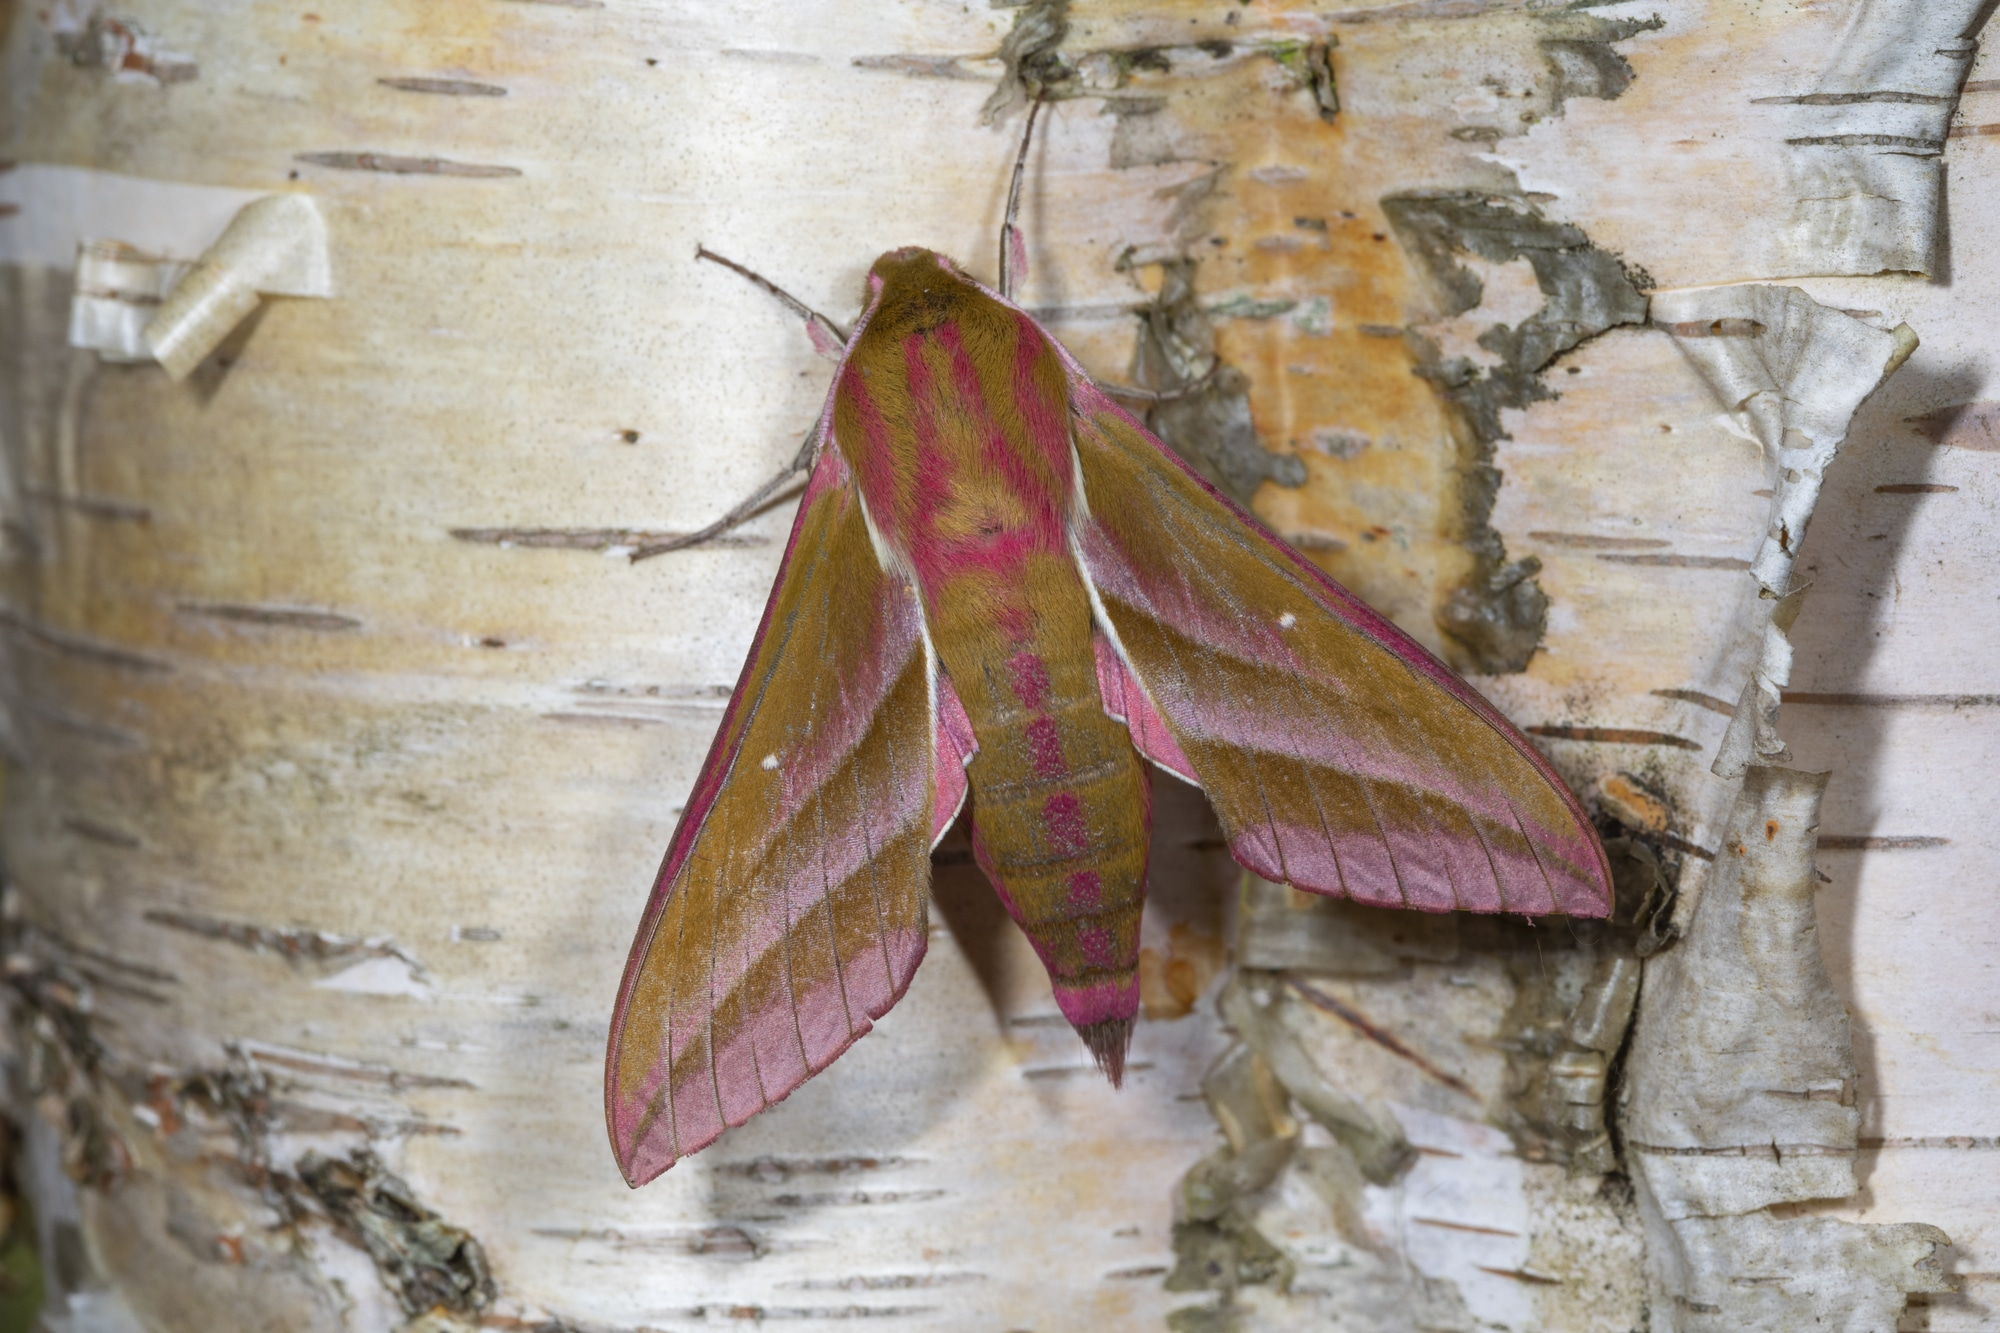 Large elephant hawk moth, deilephila elpenor on Silver birch